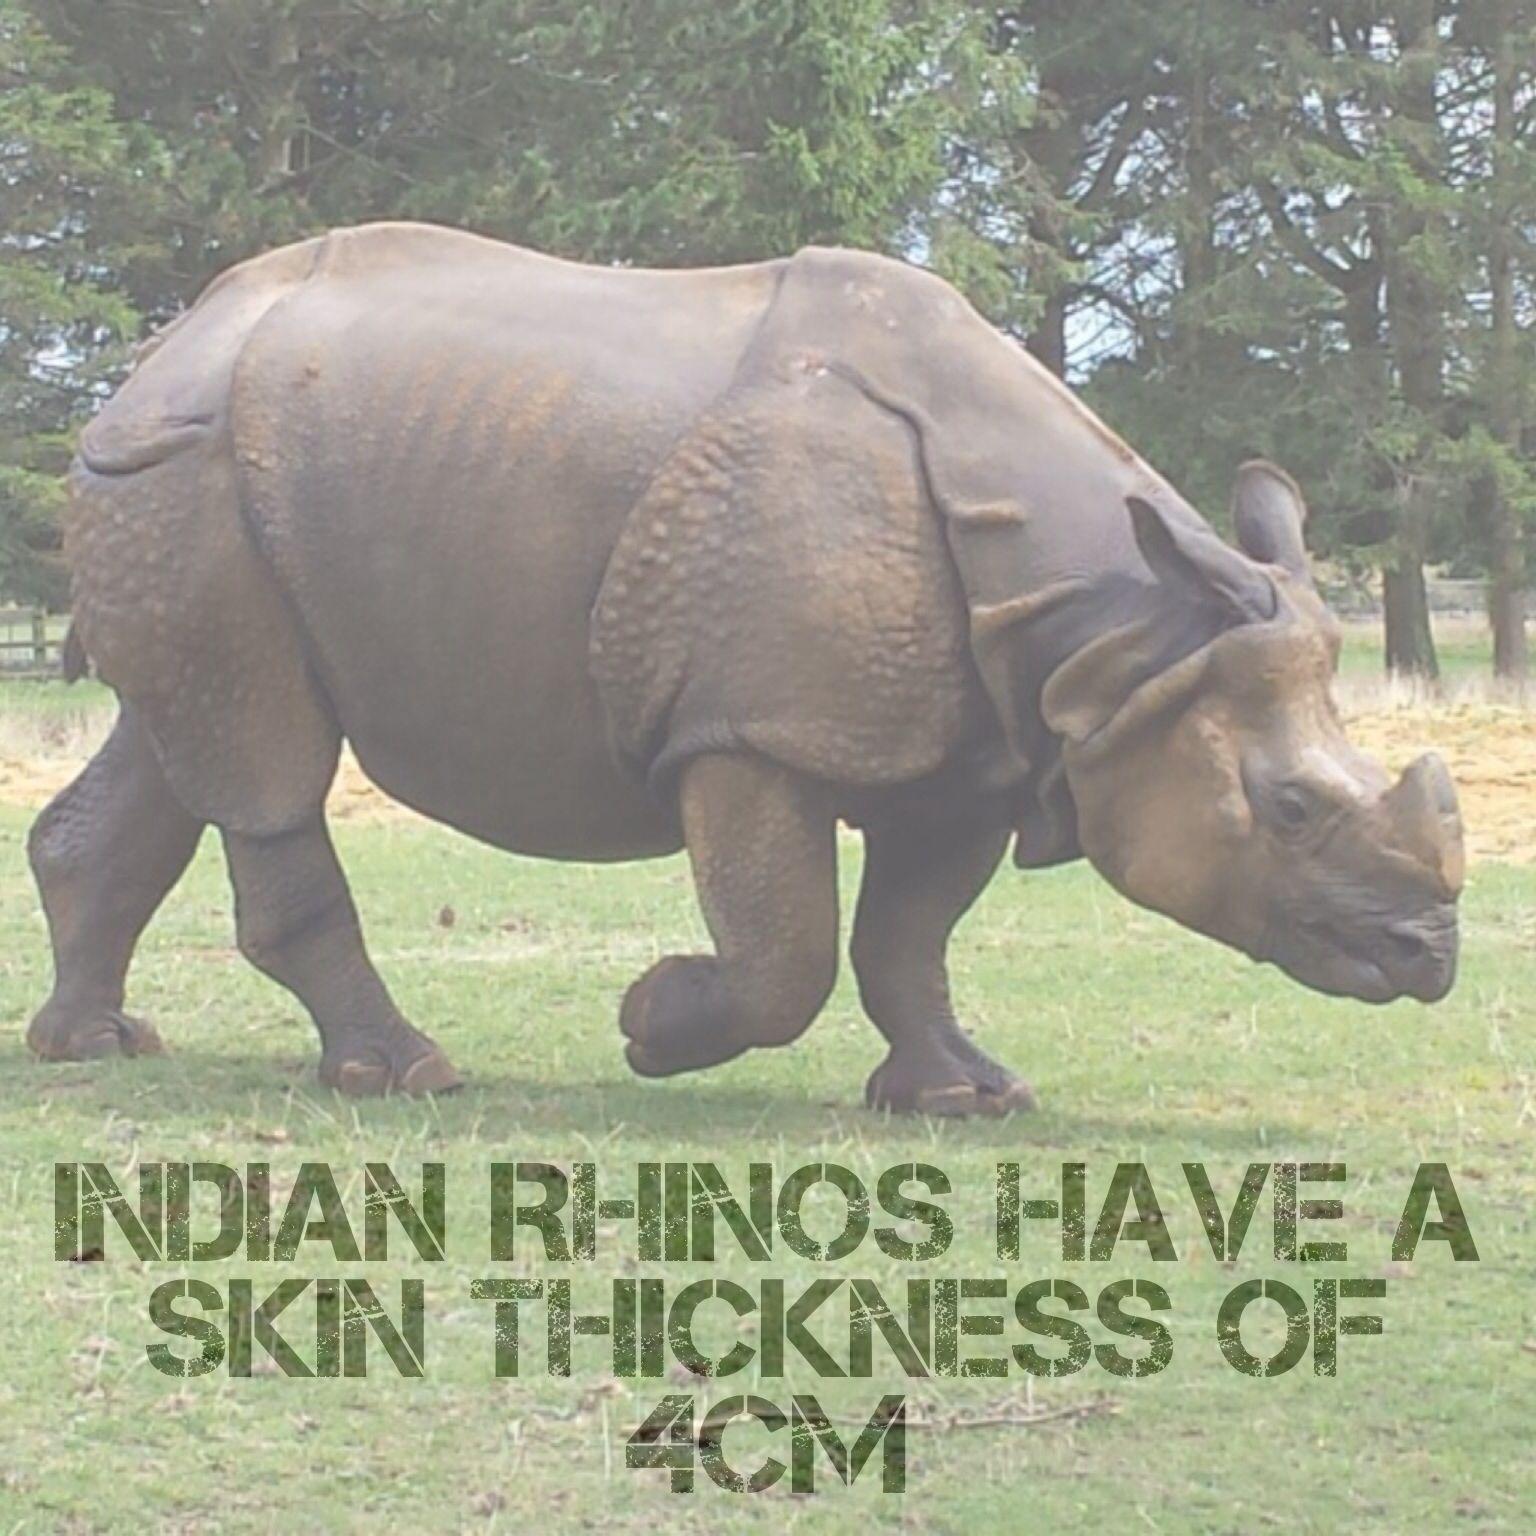 Indian Rhinos have a skin thickness of 4cm #rhino #rhinos